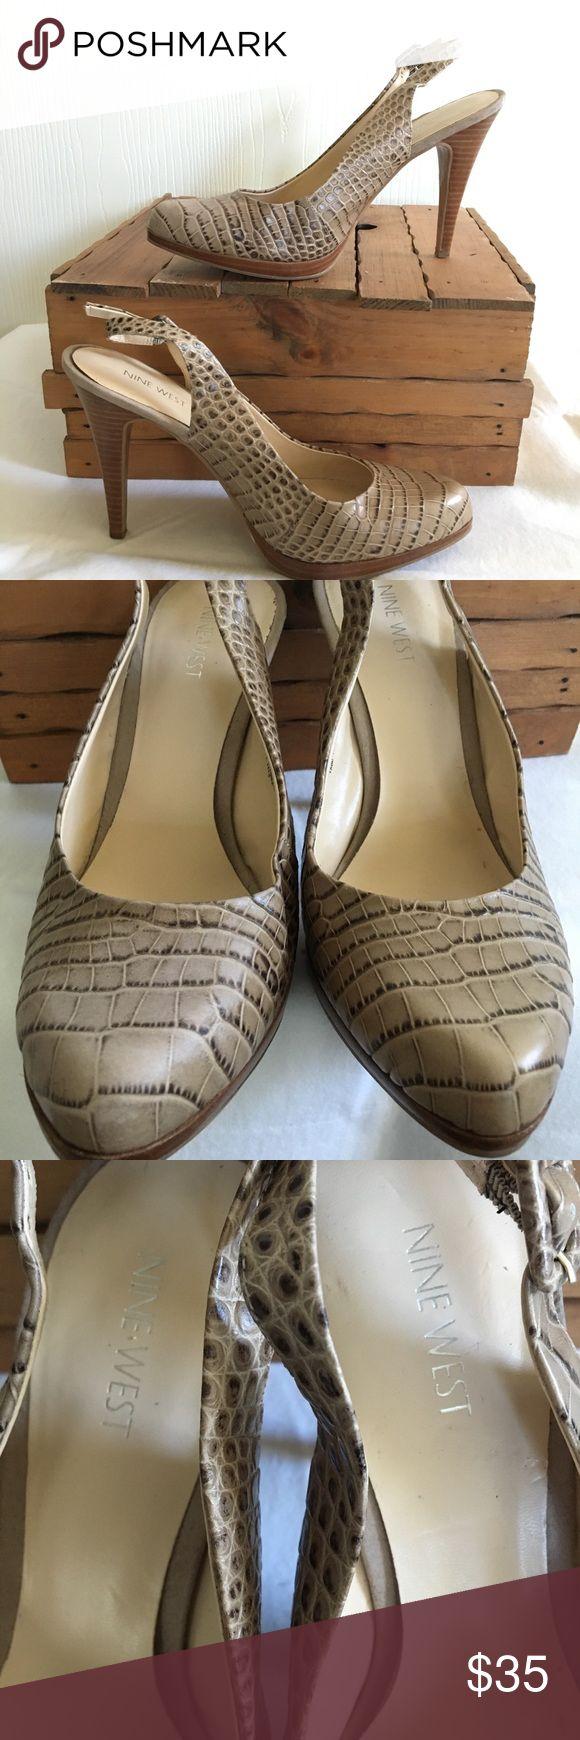 "Nine West Heels Preowned-Nine West embossed-snake like, tan platforms size 10, sling back with adjustable straps, 4.5"" heel, gently used, in very good condition ‼️😍 Nine West Shoes Heels"